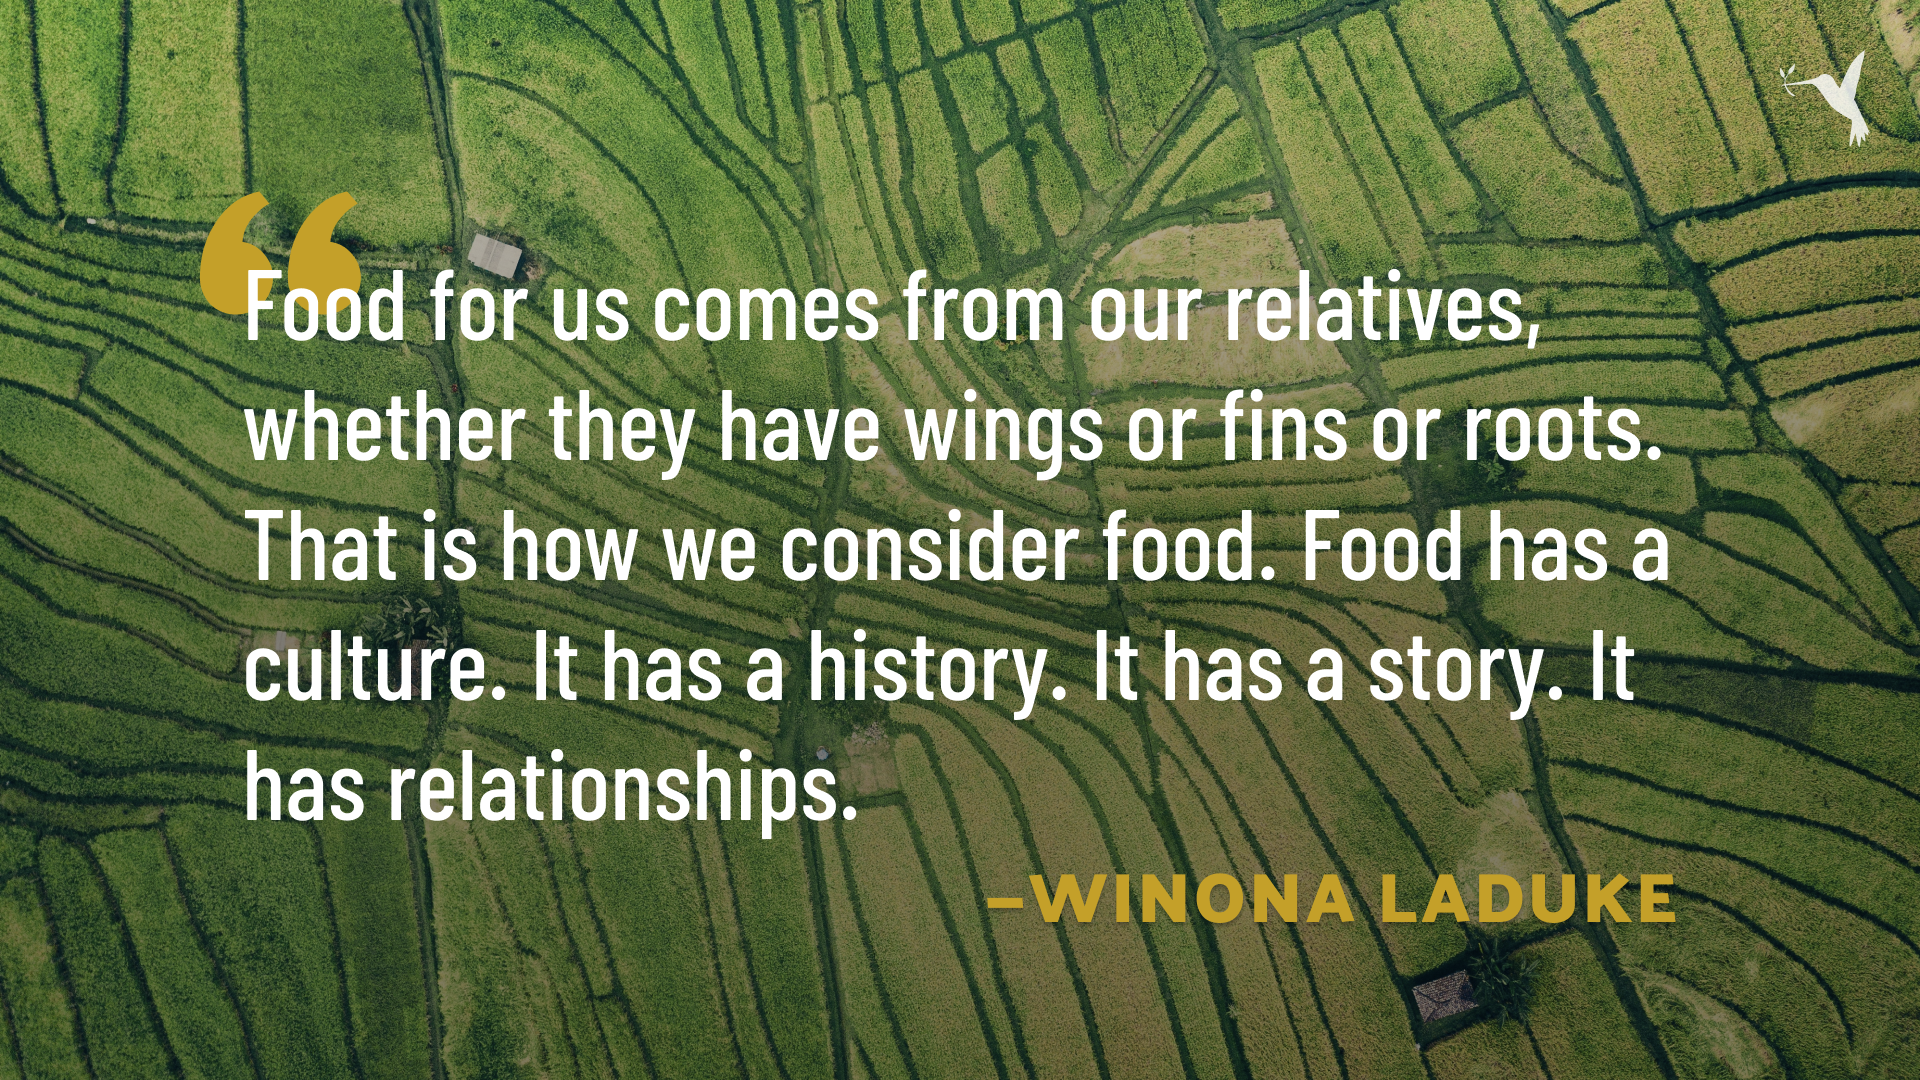 Winona LaDuke quote